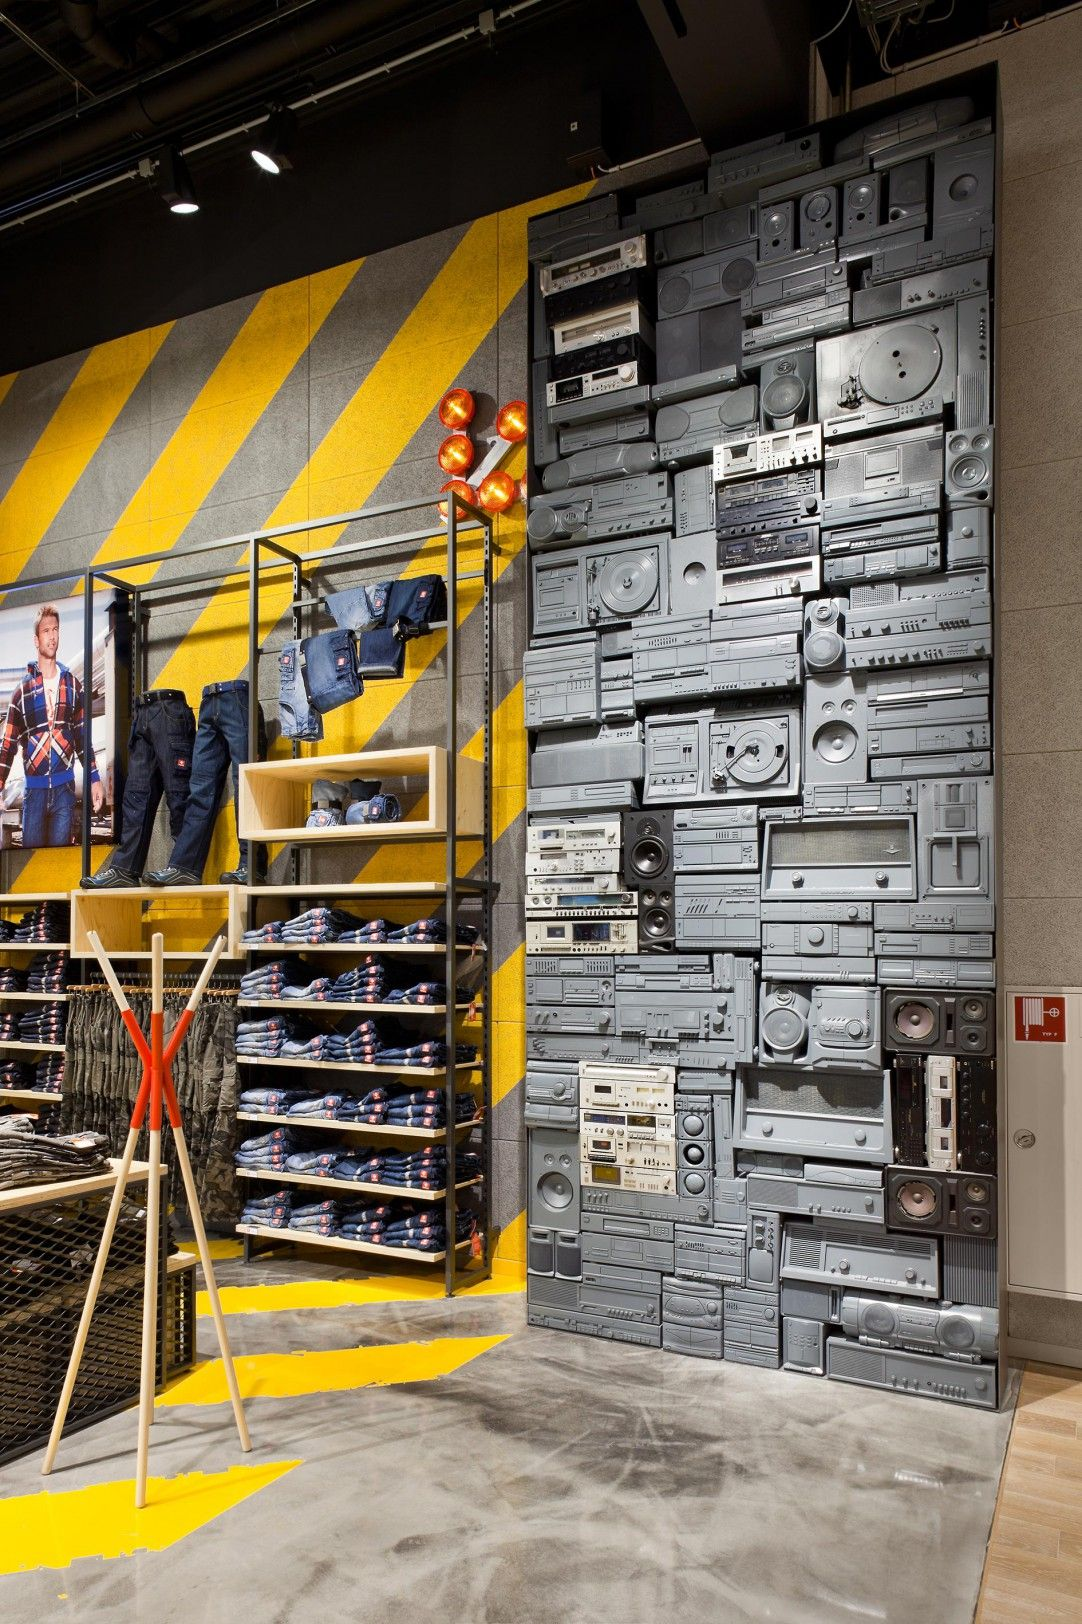 engelbert strauss workwear plajer franz studio sell. Black Bedroom Furniture Sets. Home Design Ideas